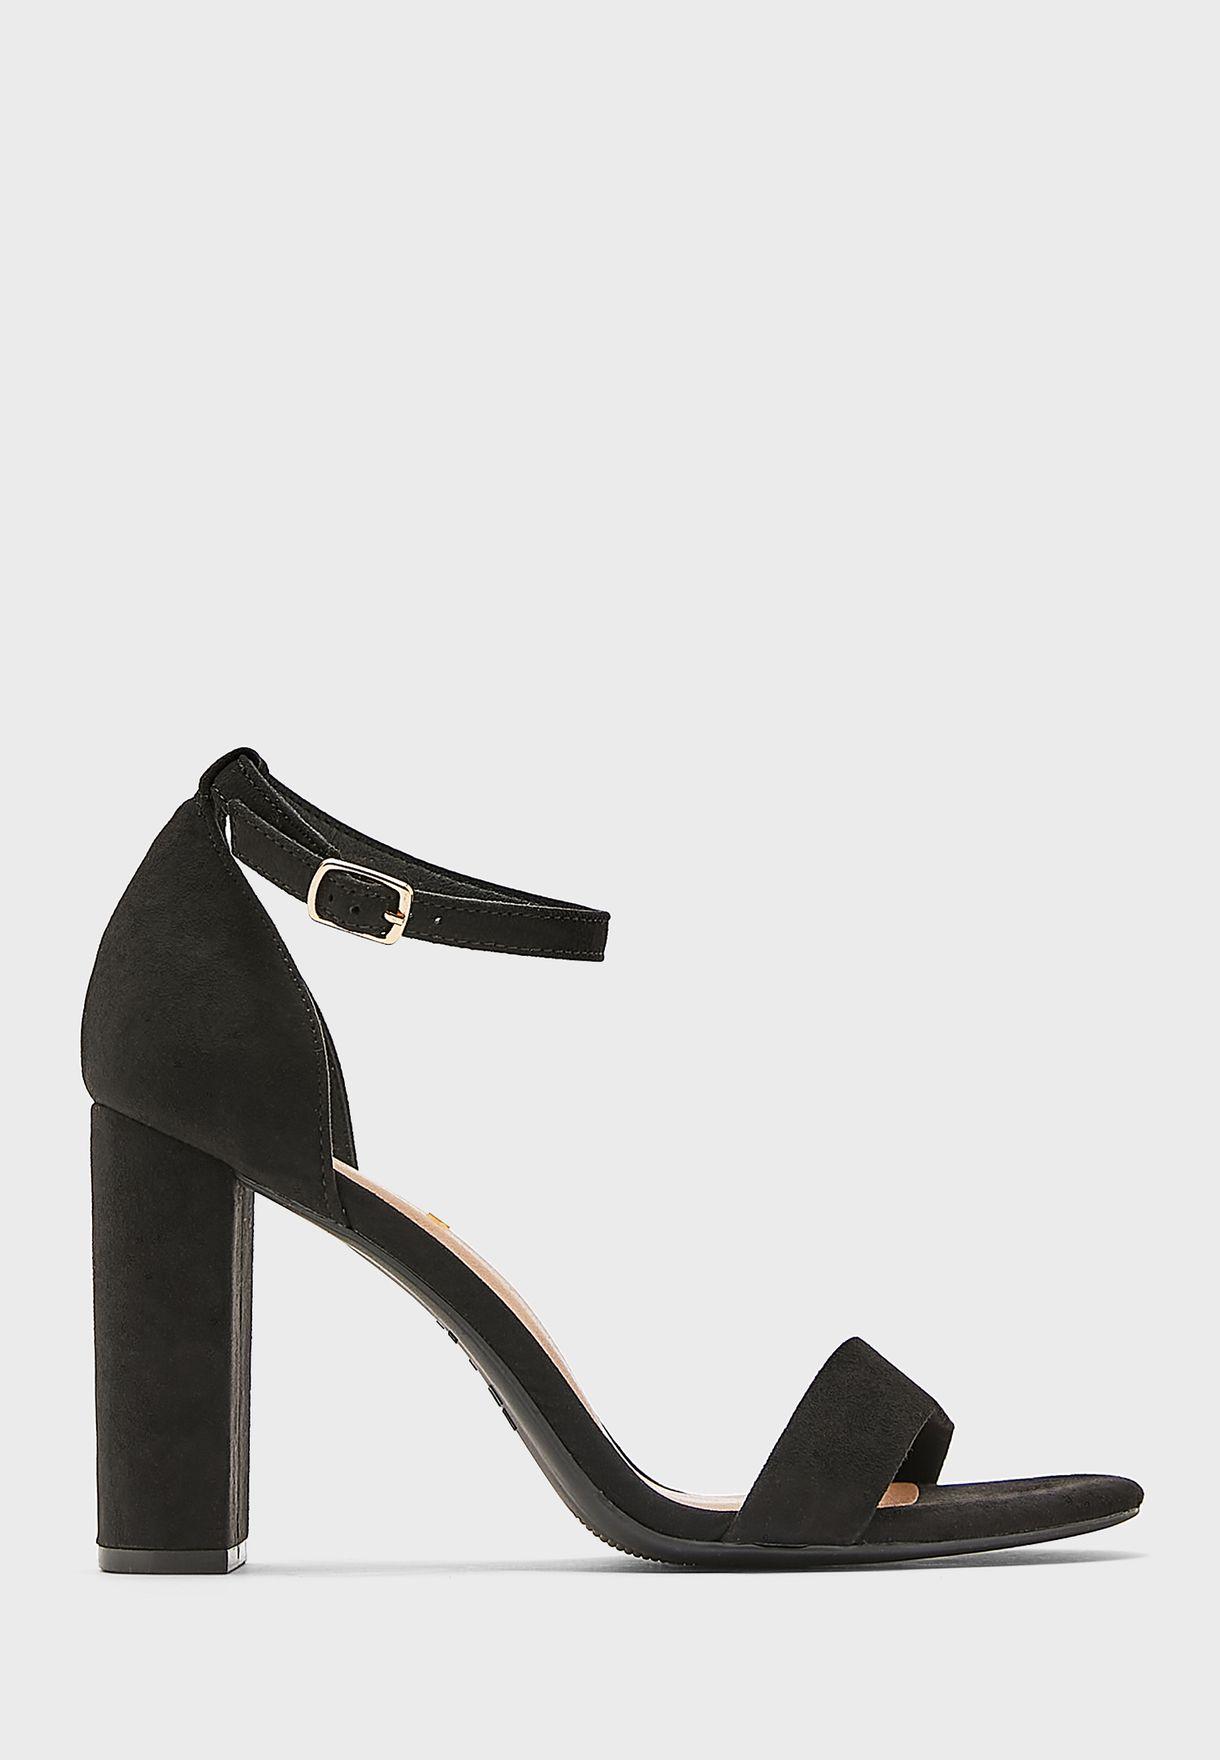 Wide Fit Ankle Strap High-Heel Sandals